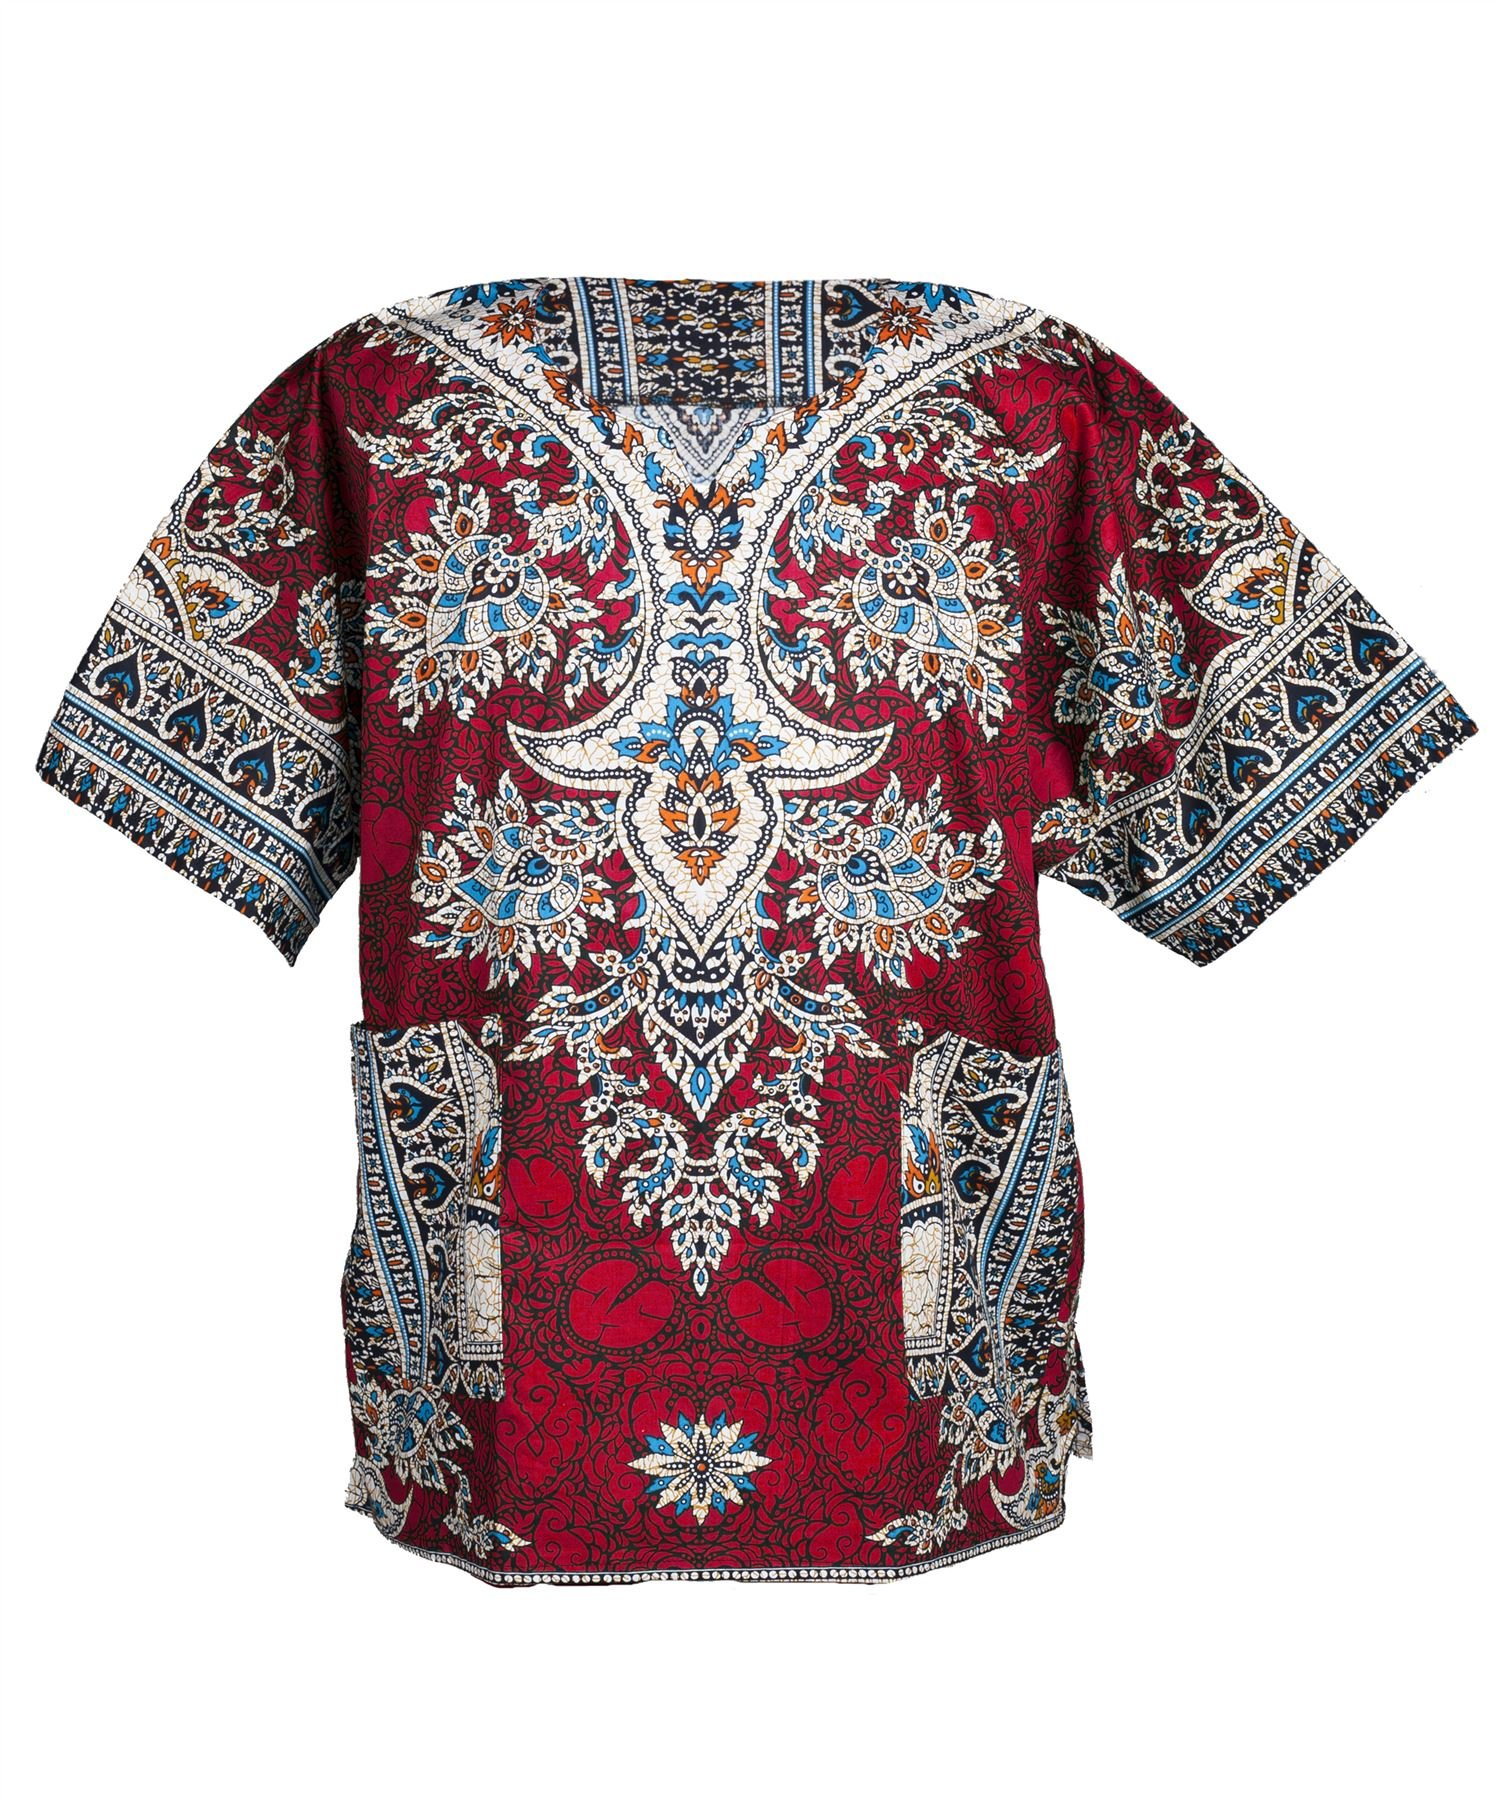 Lofbaz Traditional African Print Unisex Dashiki Ethnic Size XS Red